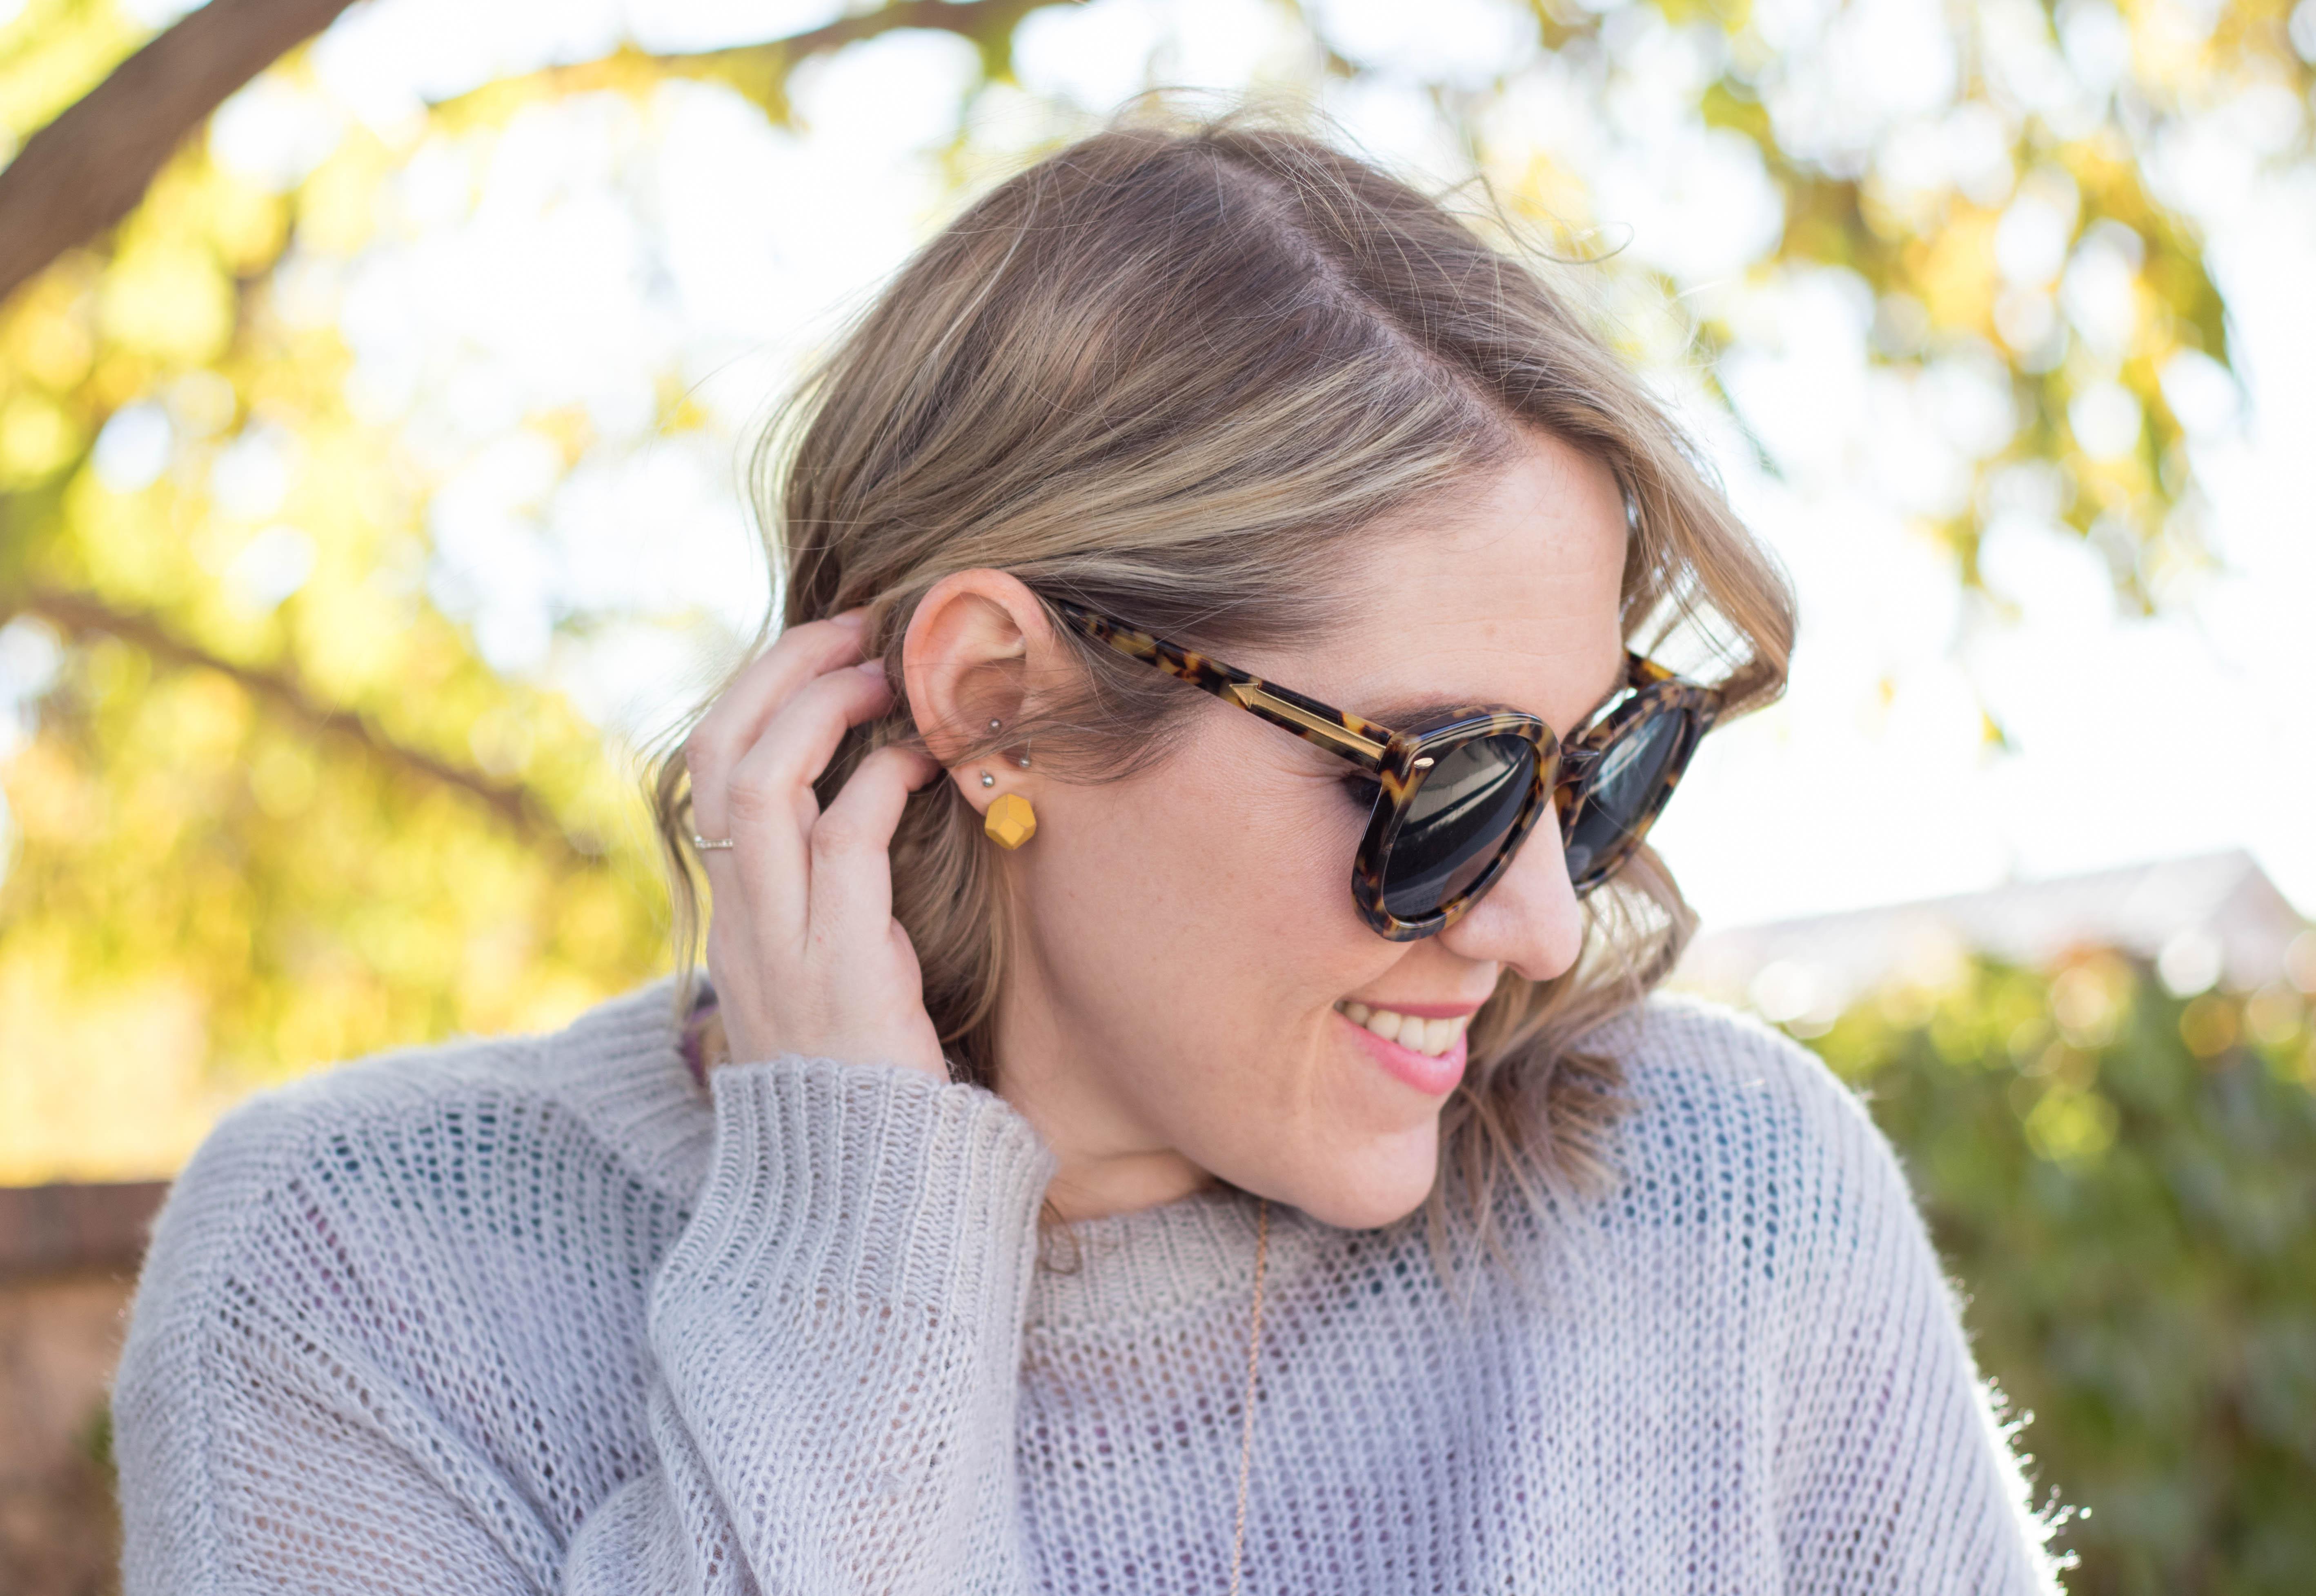 Danny hart wooden stud earrings #woodjewelry #jewelry #newmexico